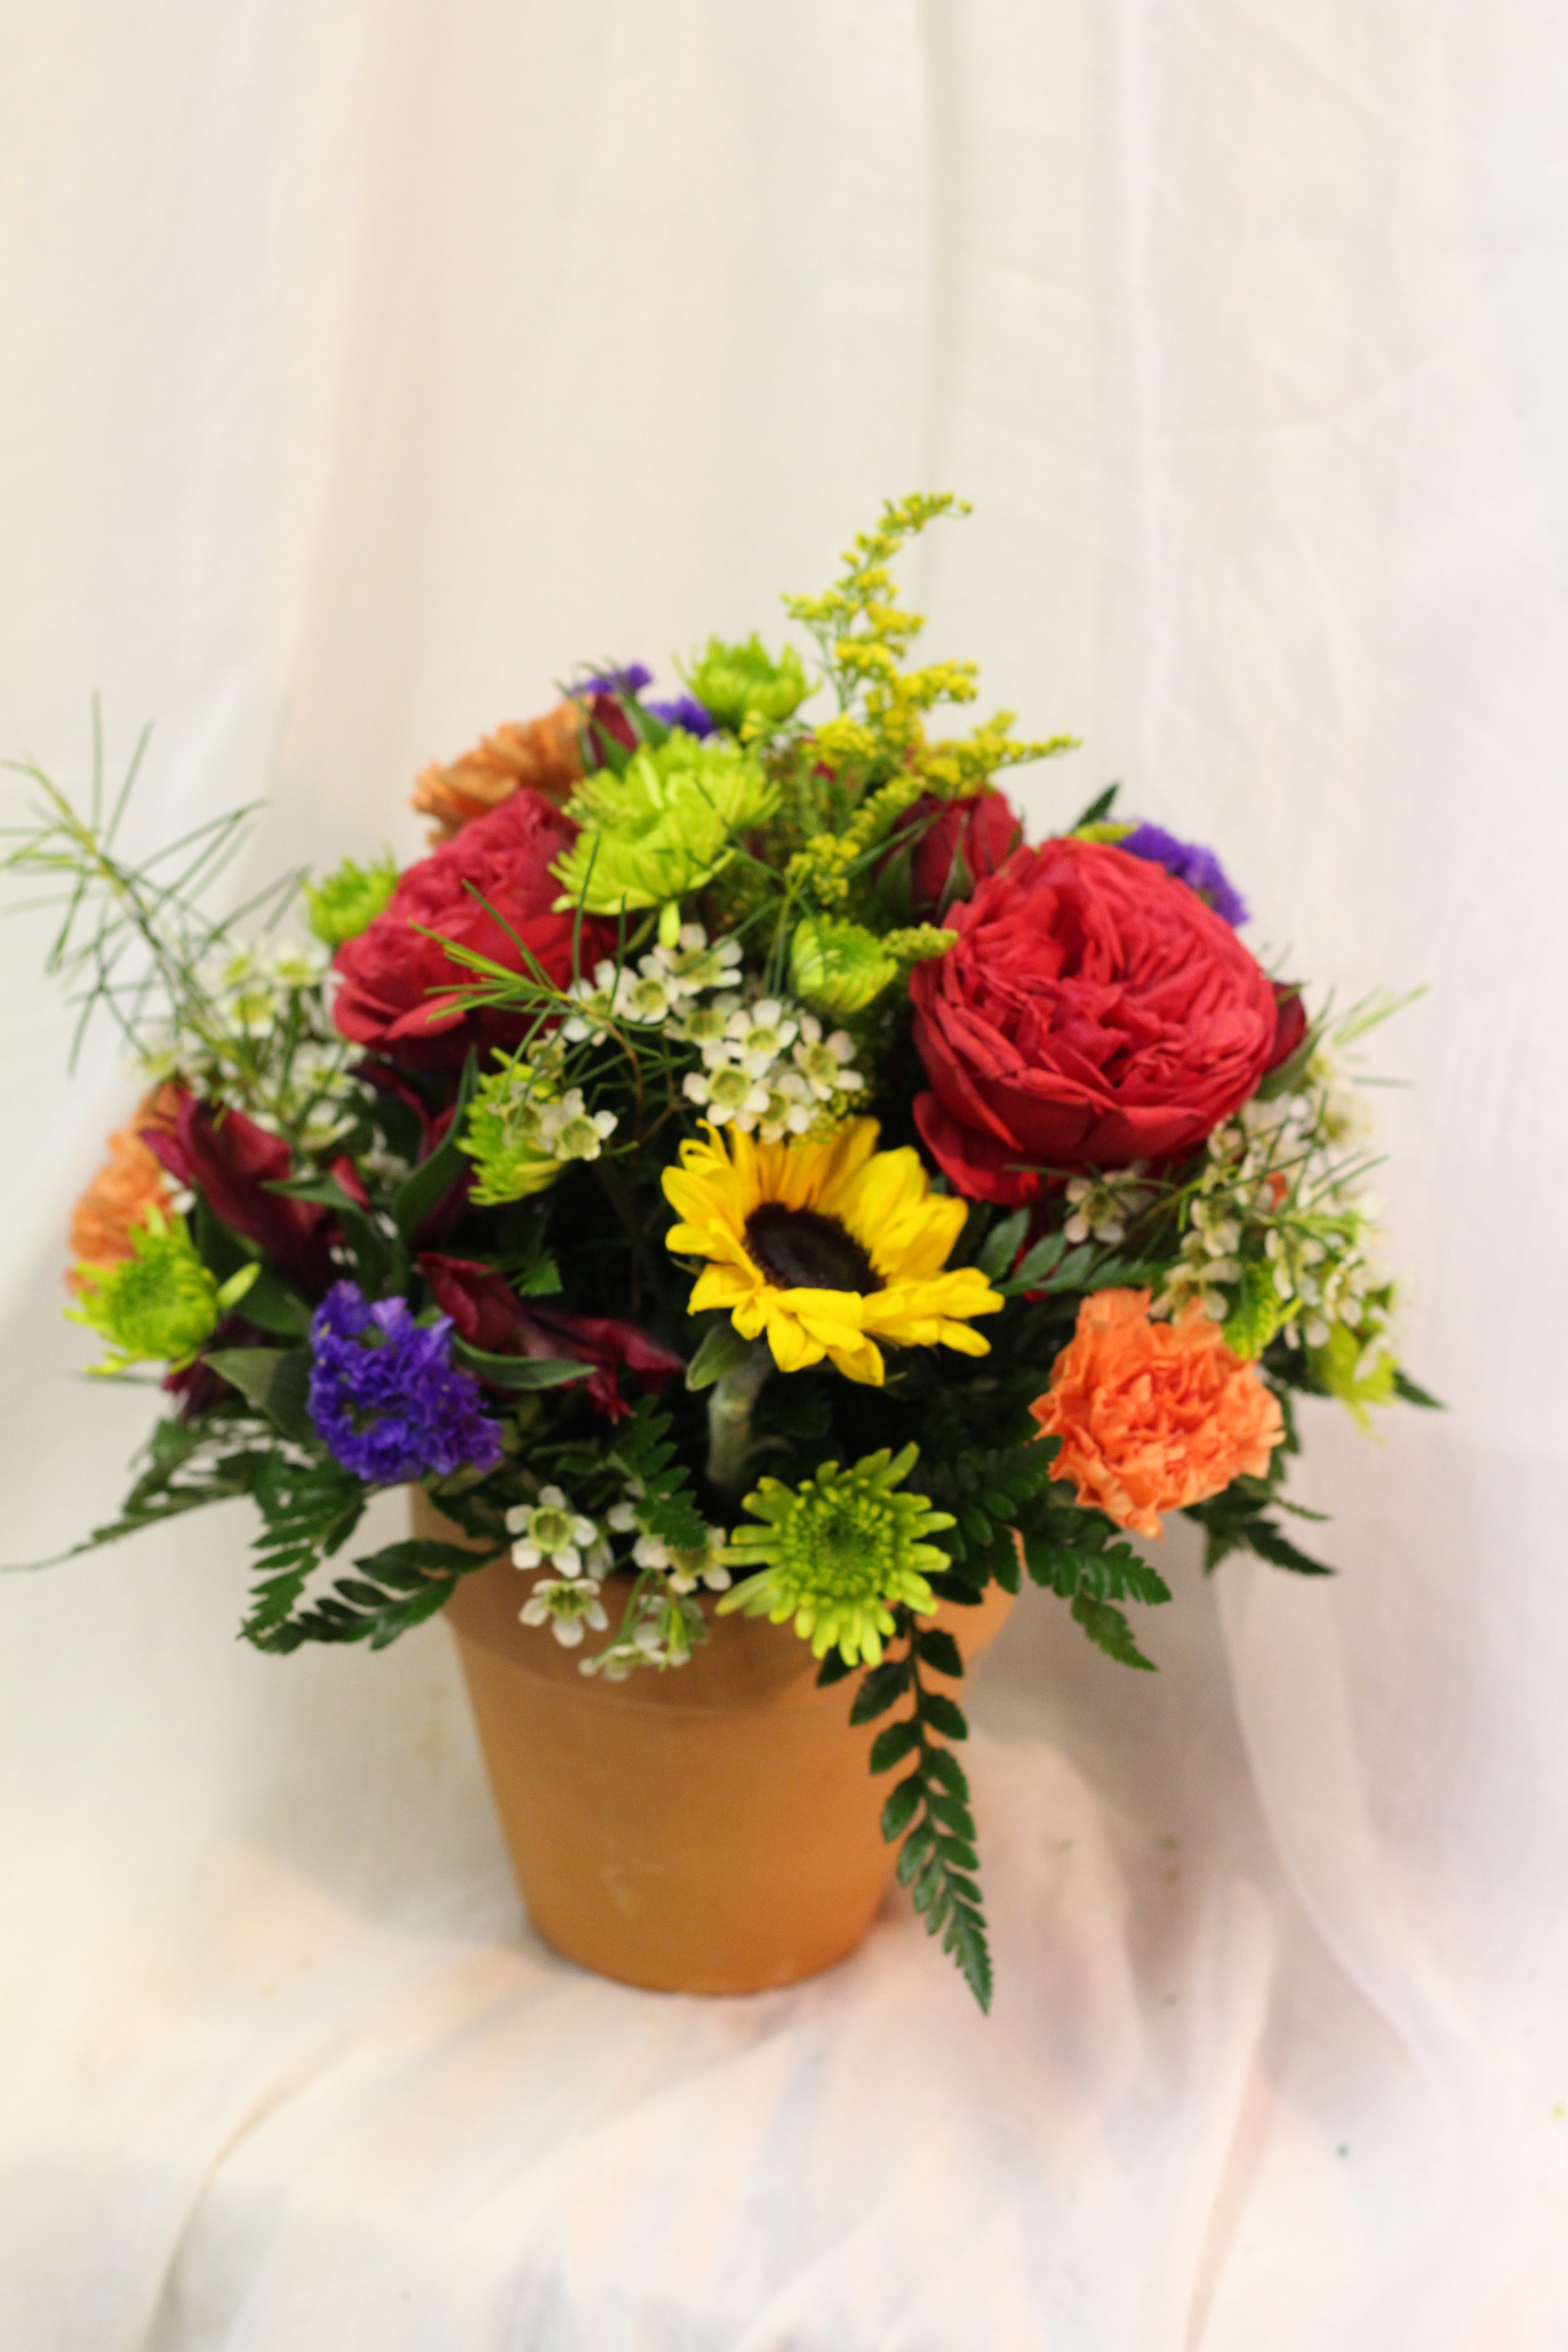 Clay pot of cut flowers.JPG